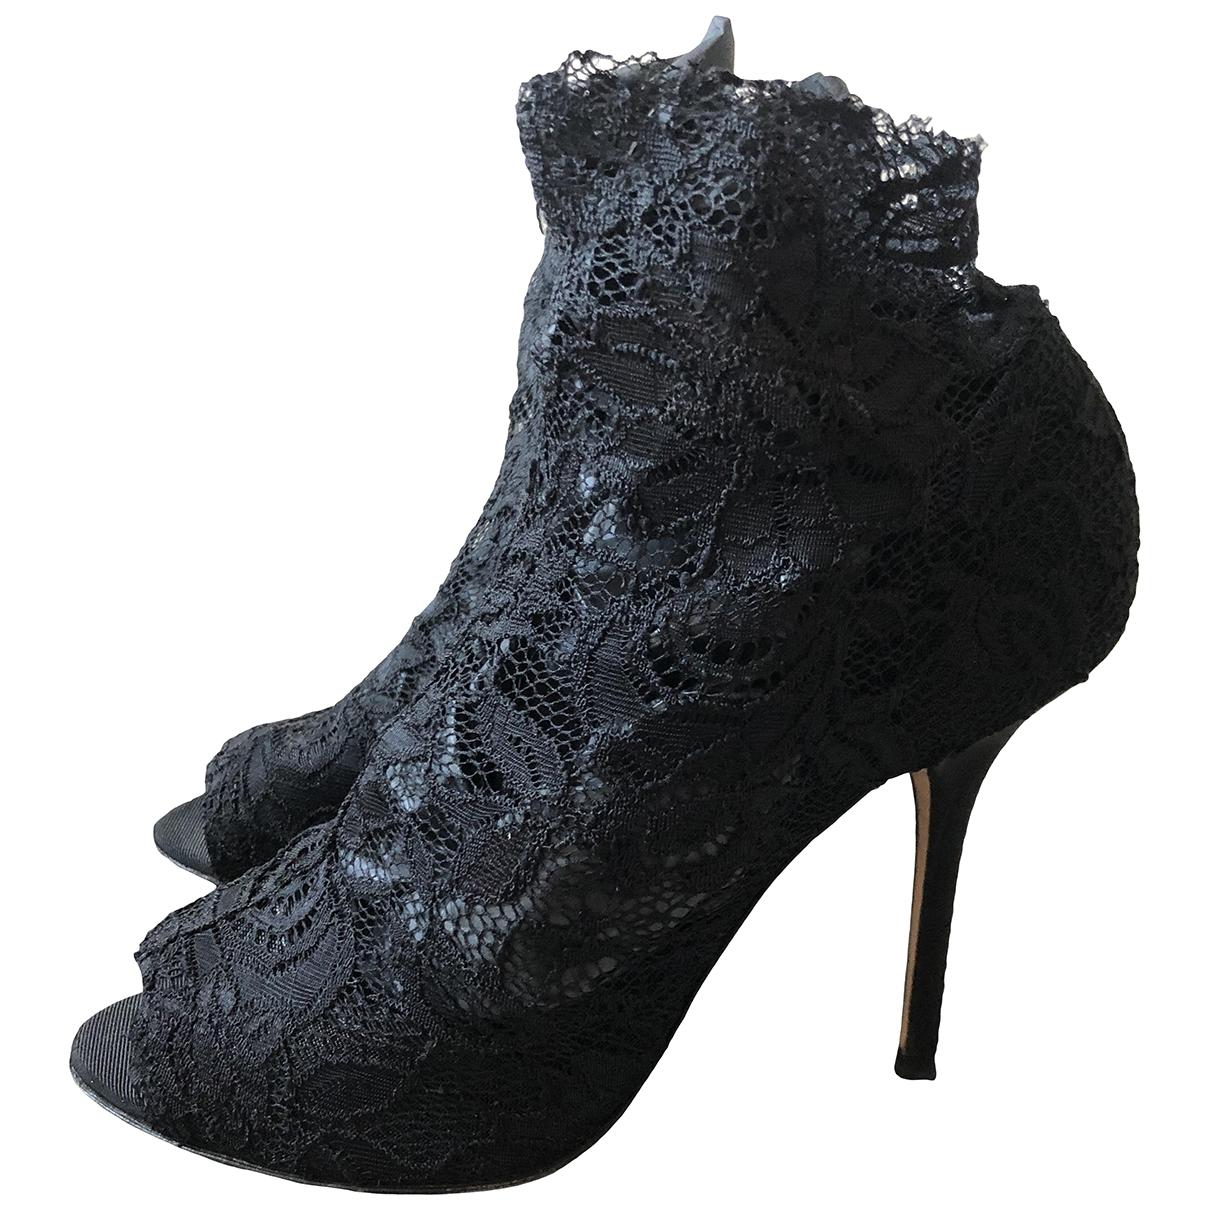 Dolce & Gabbana \N Black Cloth Ankle boots for Women 39 EU